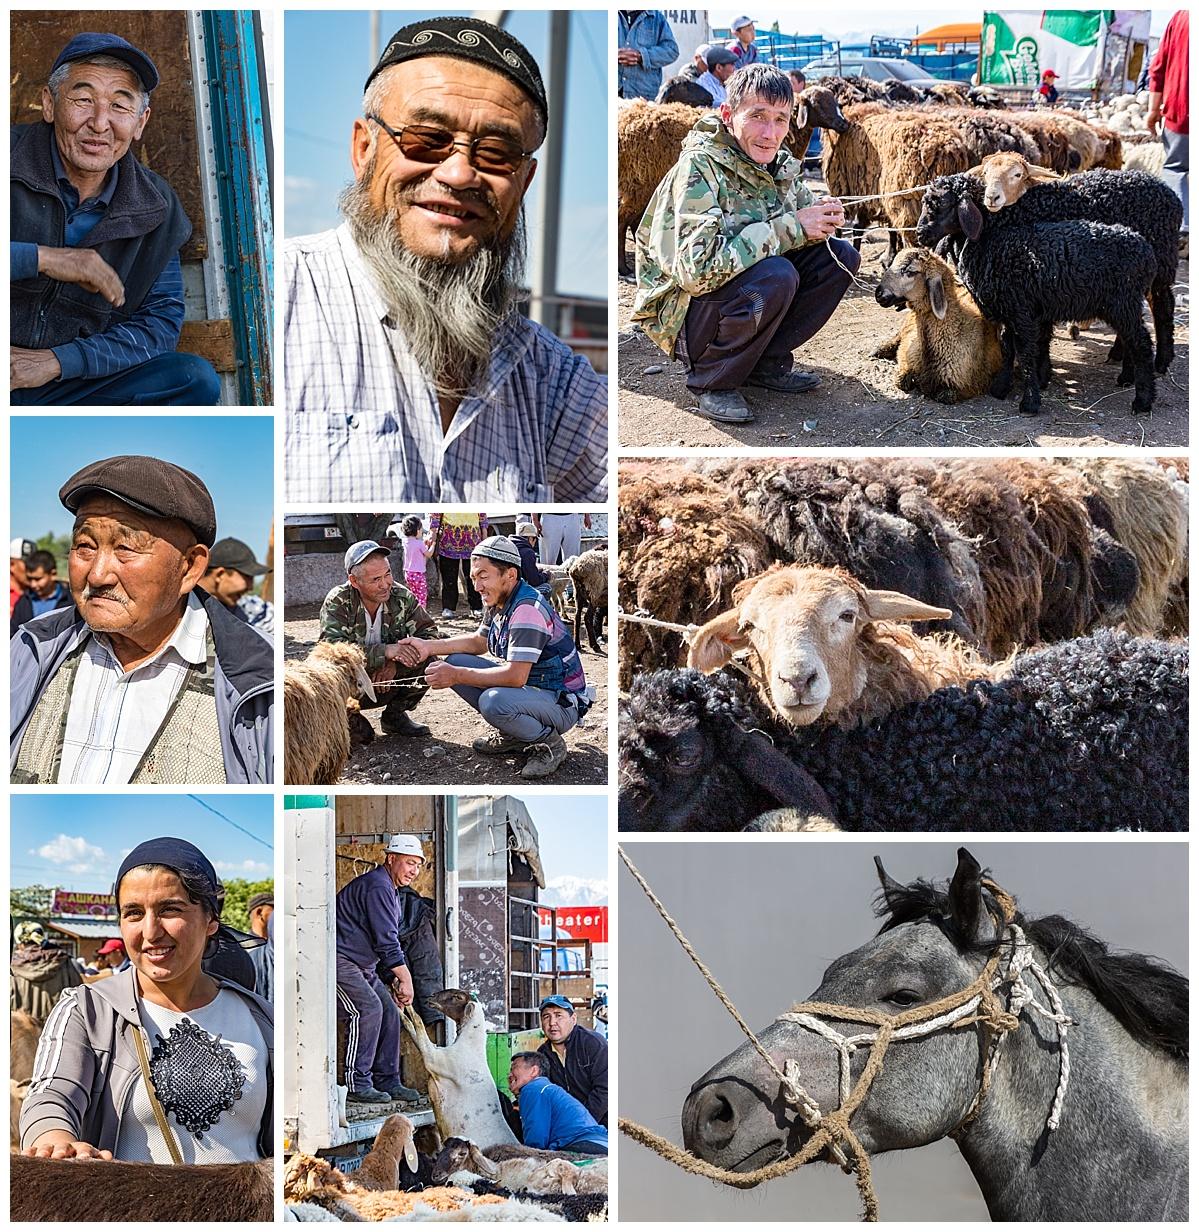 Issyk Kul, Kyrgyzstan - animal market